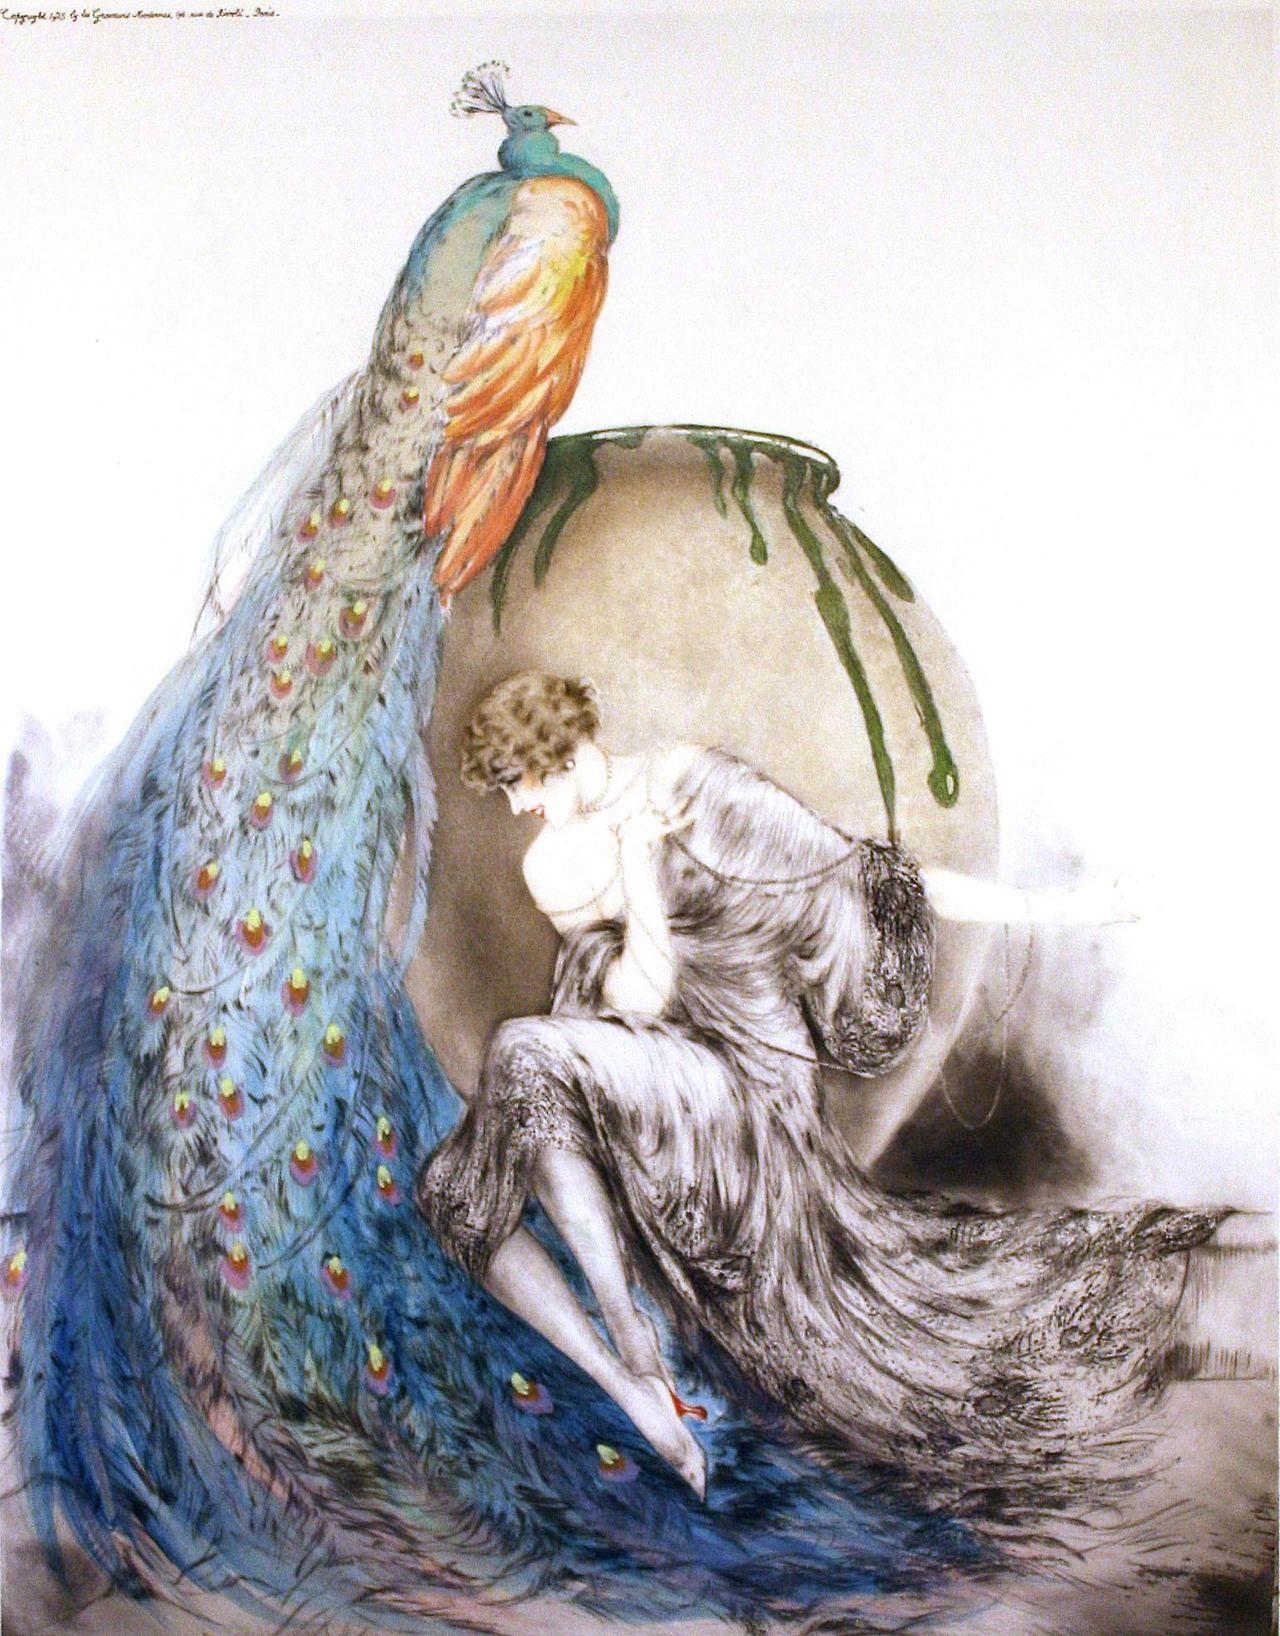 Louis Icart 'Peacock' 1925